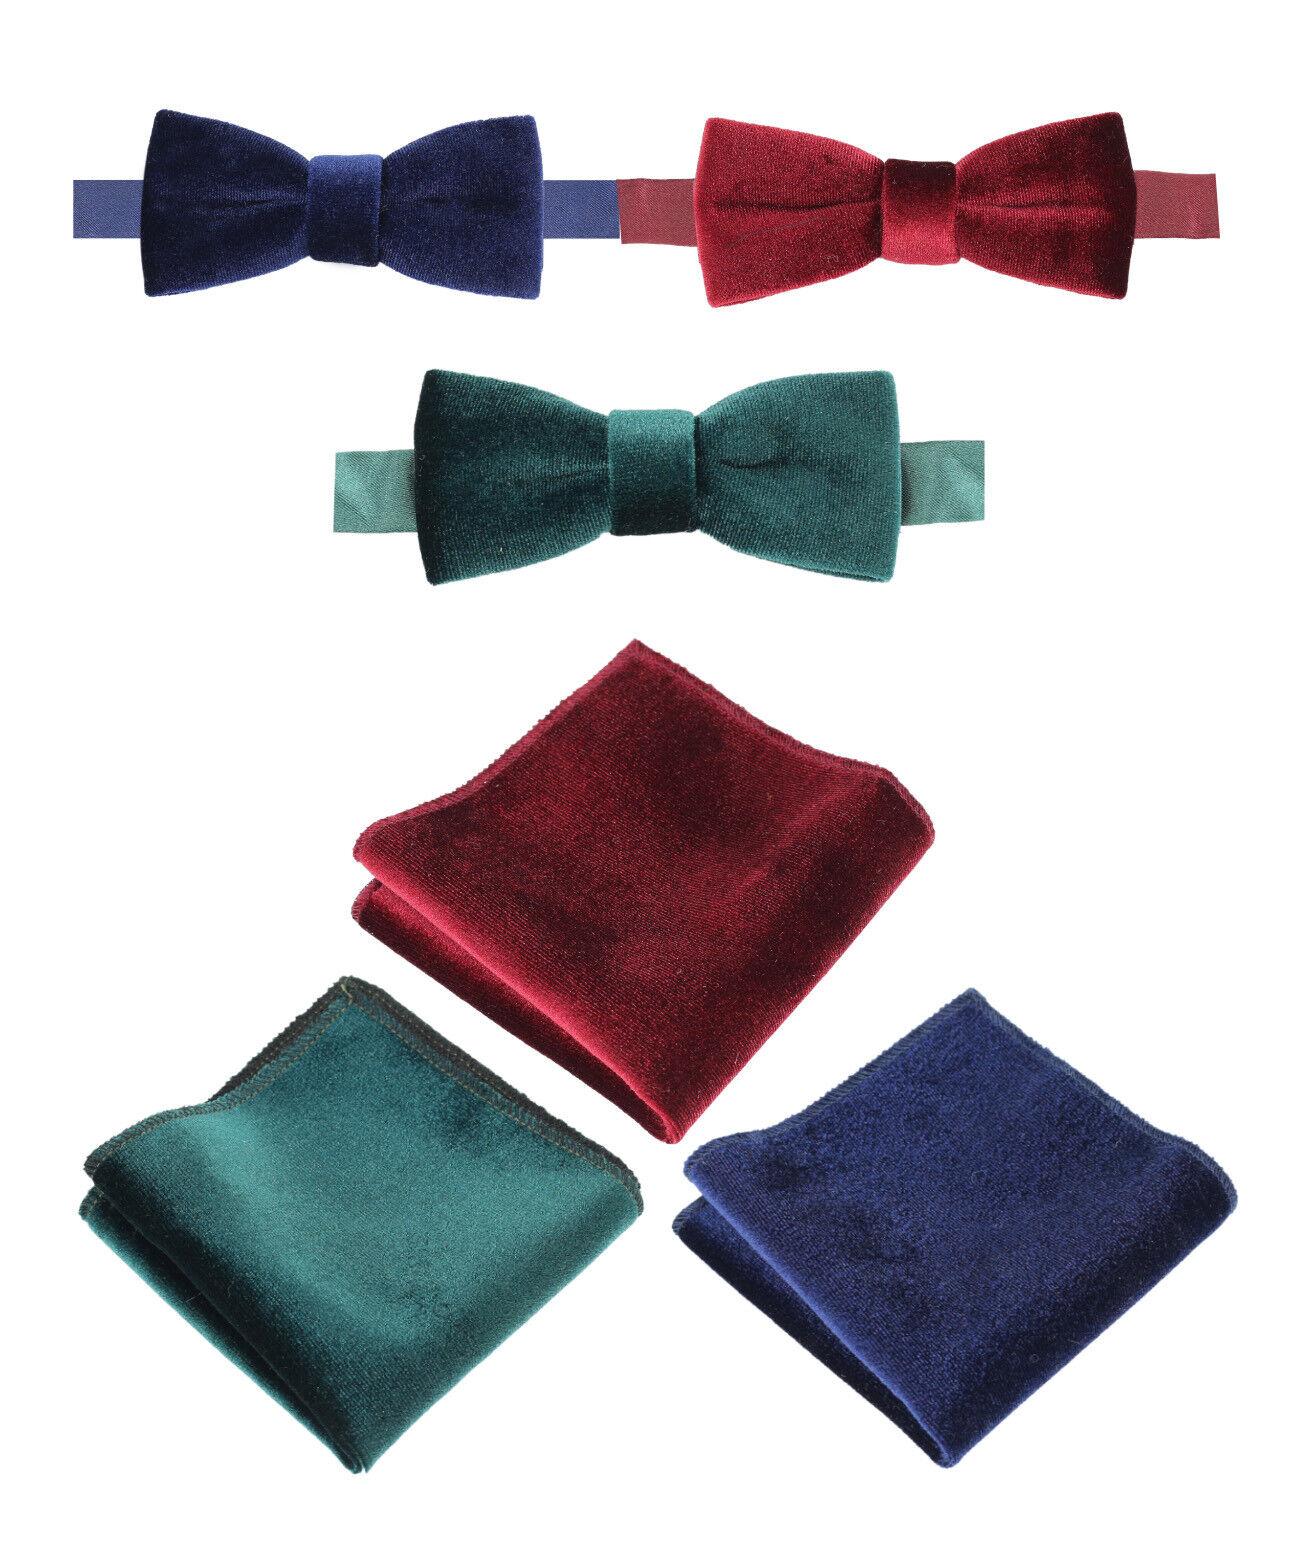 Boys Men Formal Velvet Dickie Bow Tie Hankie Pocket square Red Navy Blue Green